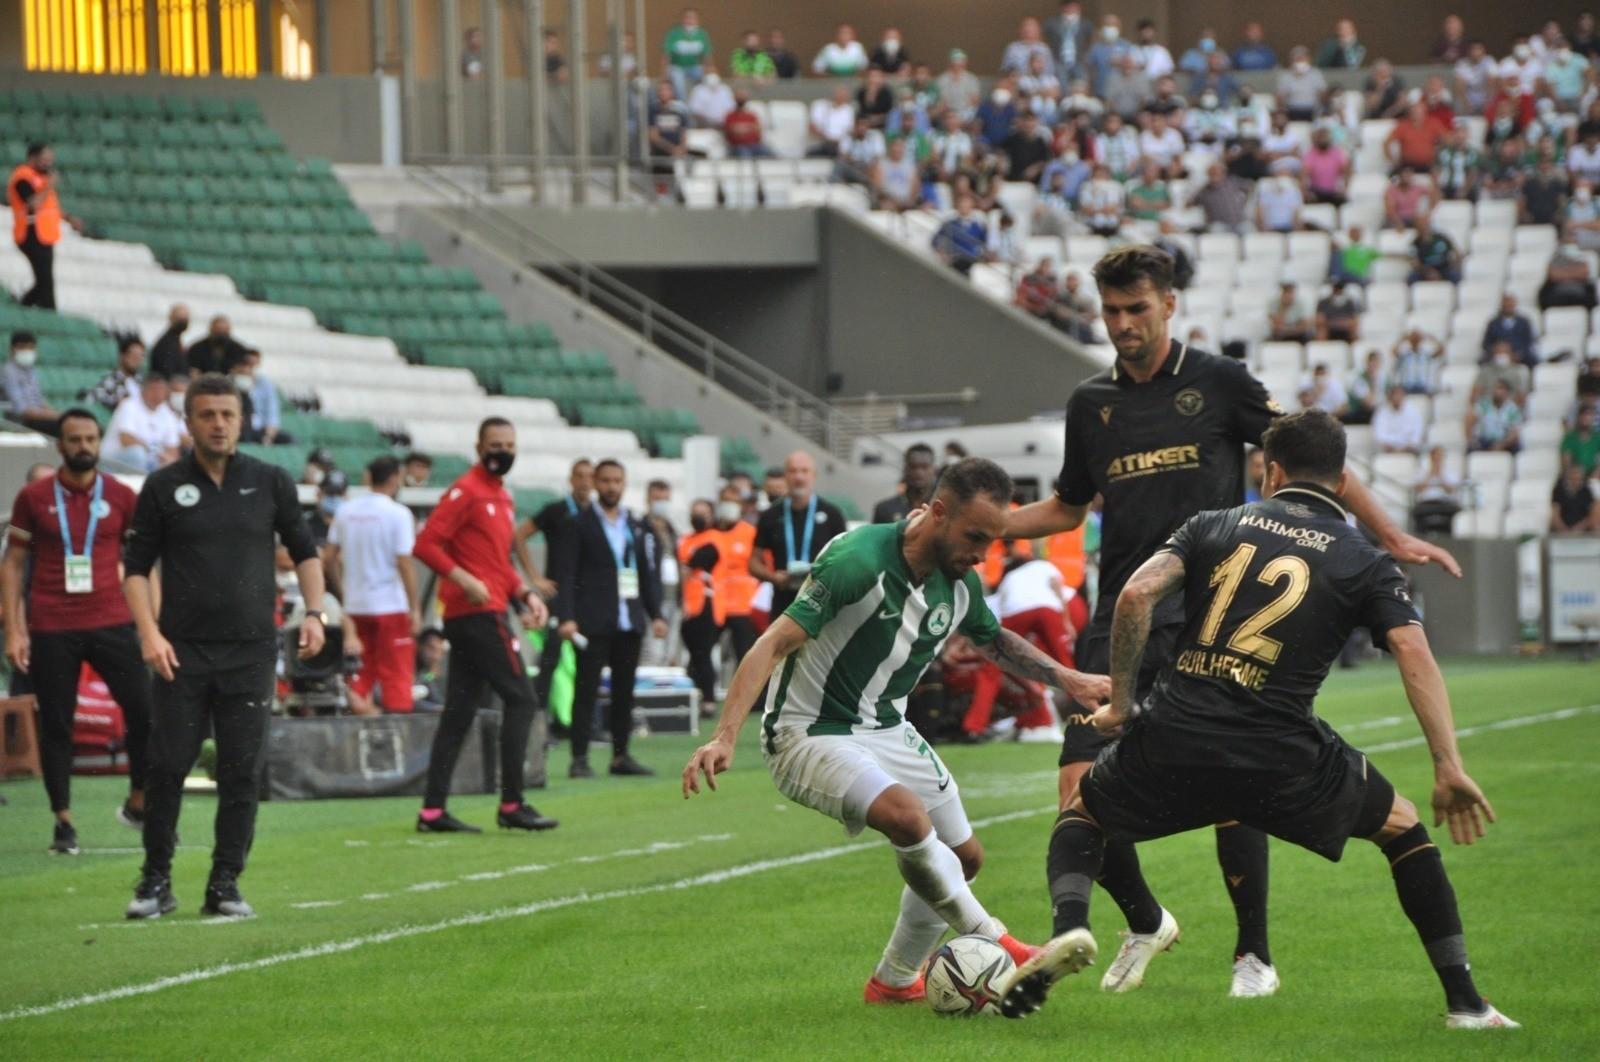 Süper Lig: GZT Giresunspor: 0 – İH Konyaspor: 0 (Maç sonucu)